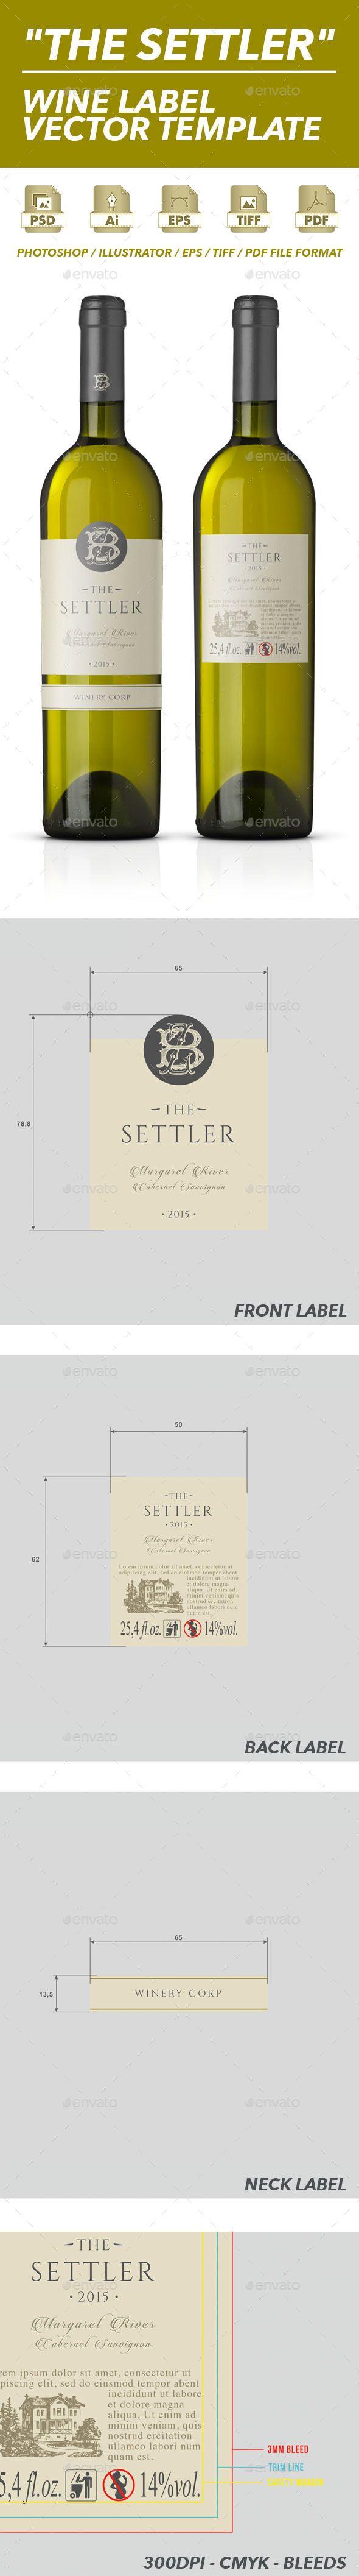 White Wine Label Vector Template   Pinterest   Print templates ...